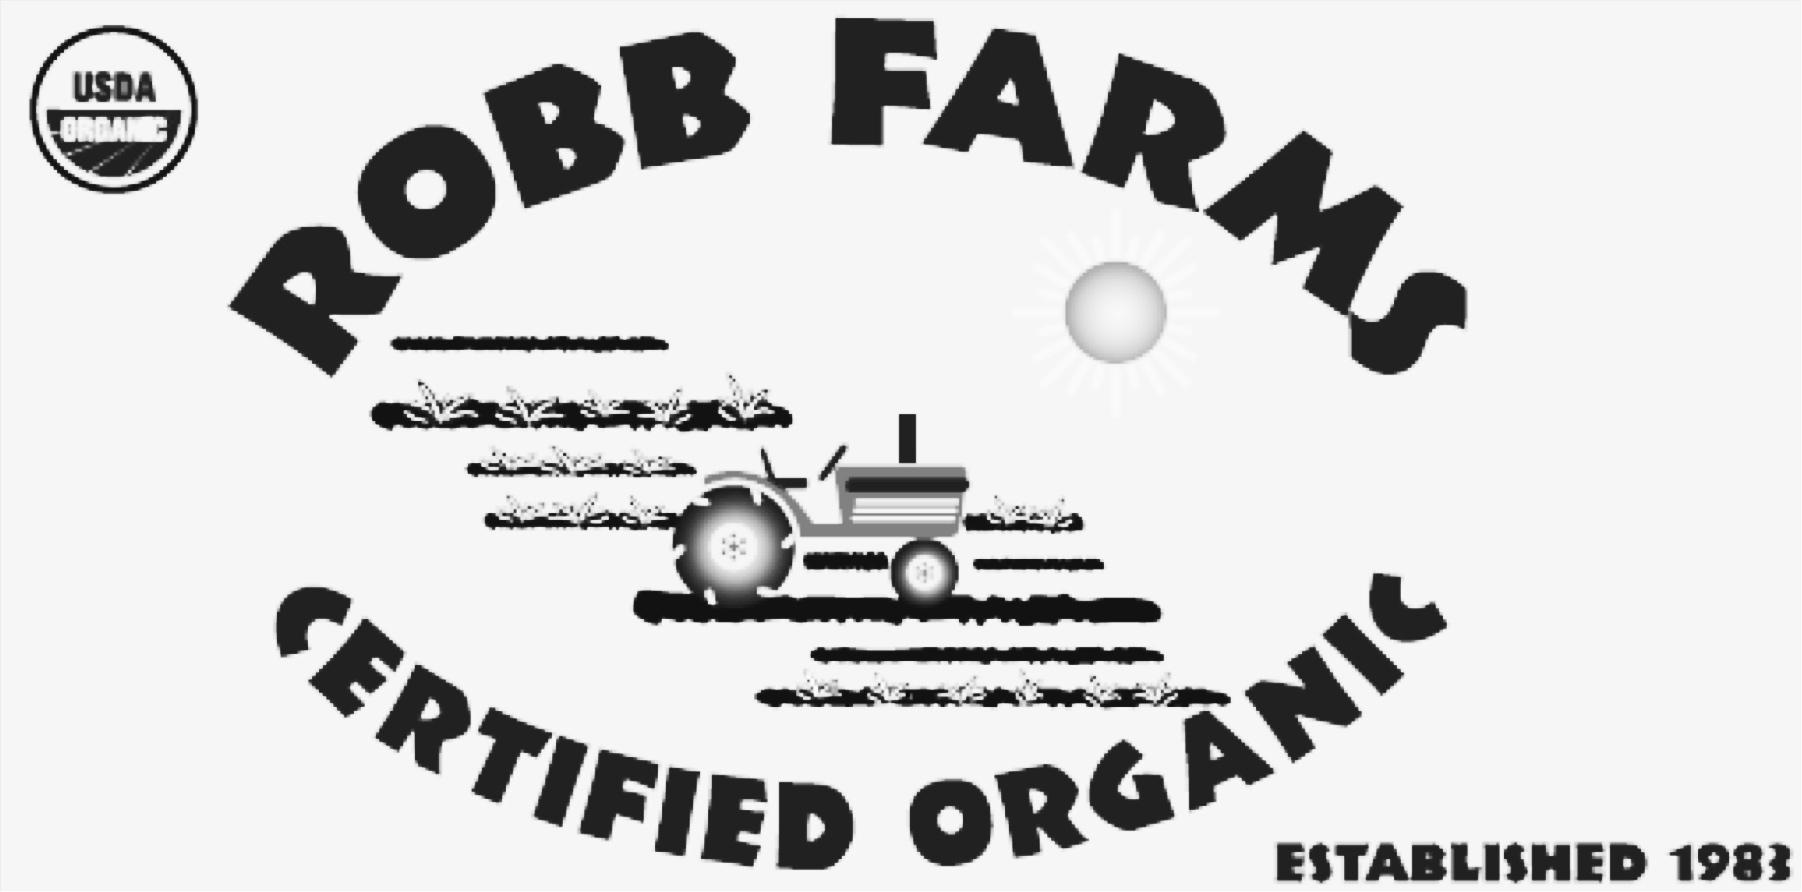 Robb Farms Black and white.jpg